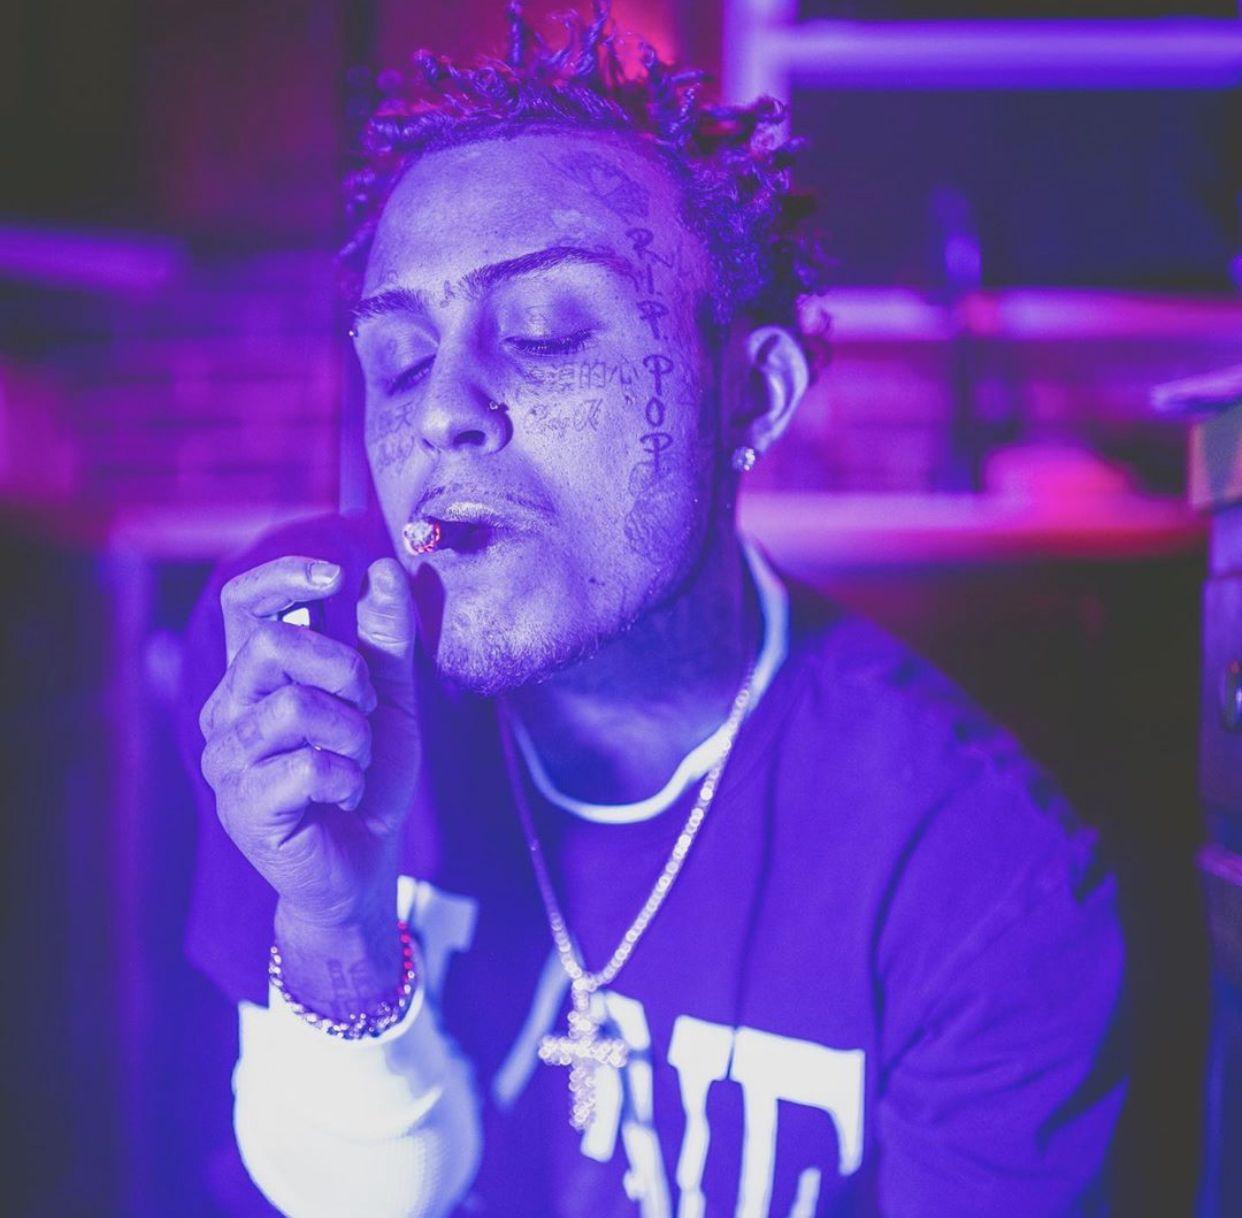 lil skies💜 in 2020 Lil skies, Musician, Purple backgrounds